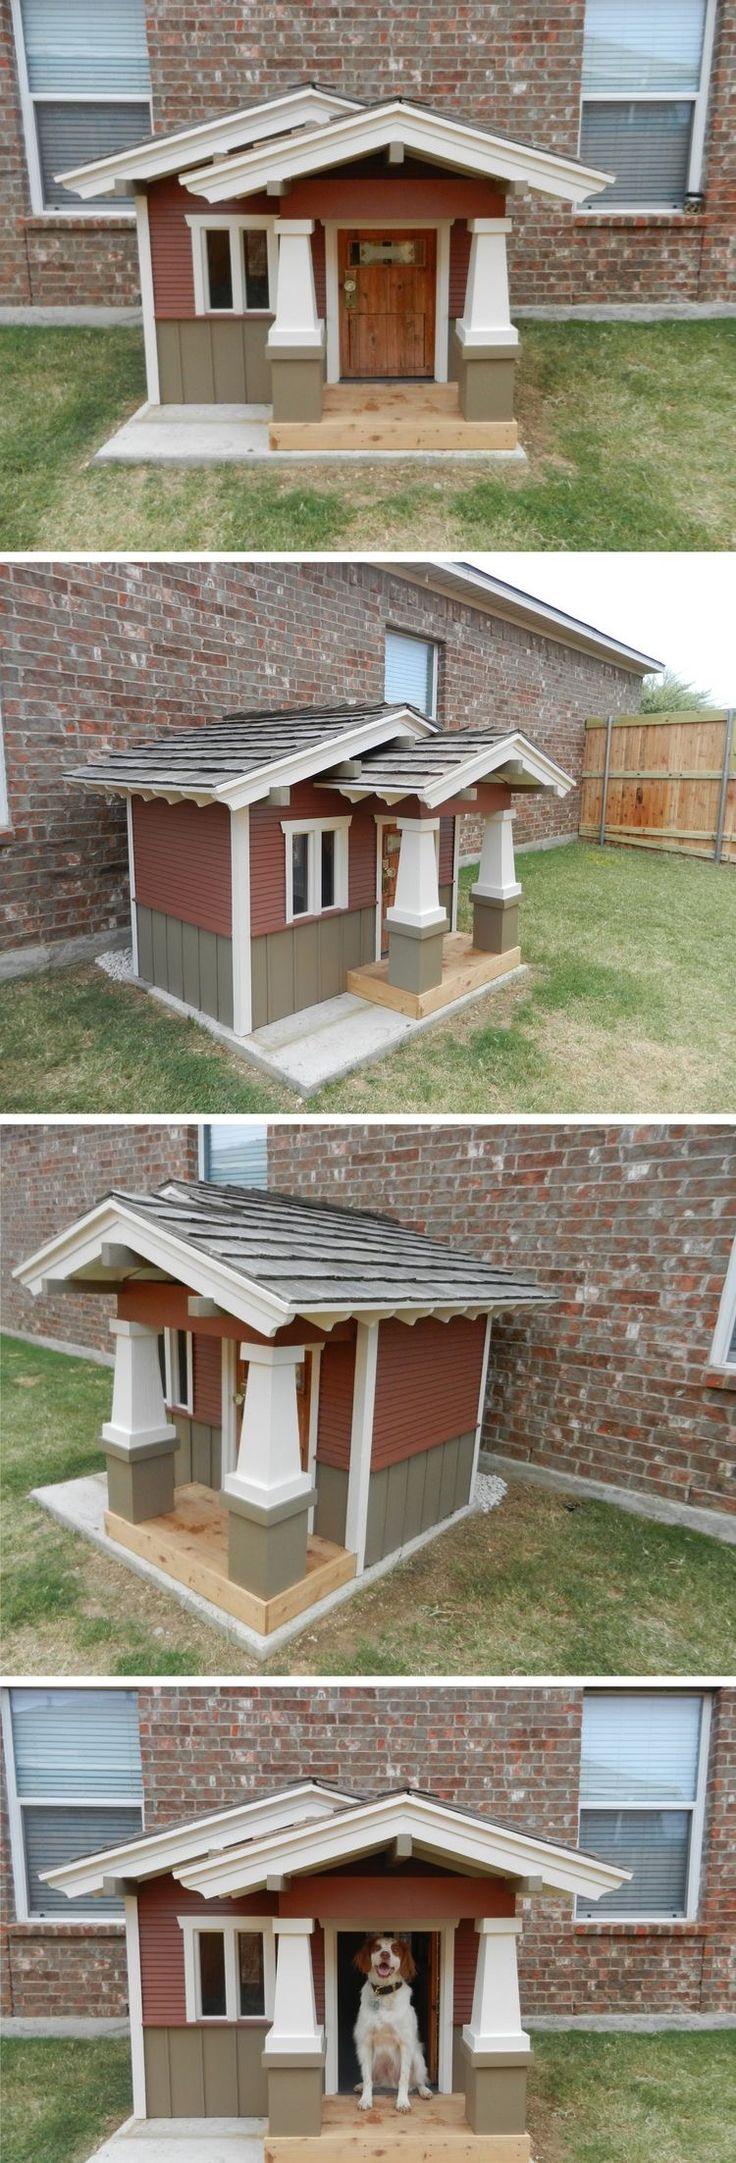 D Dog House 53 best Dog Hou...